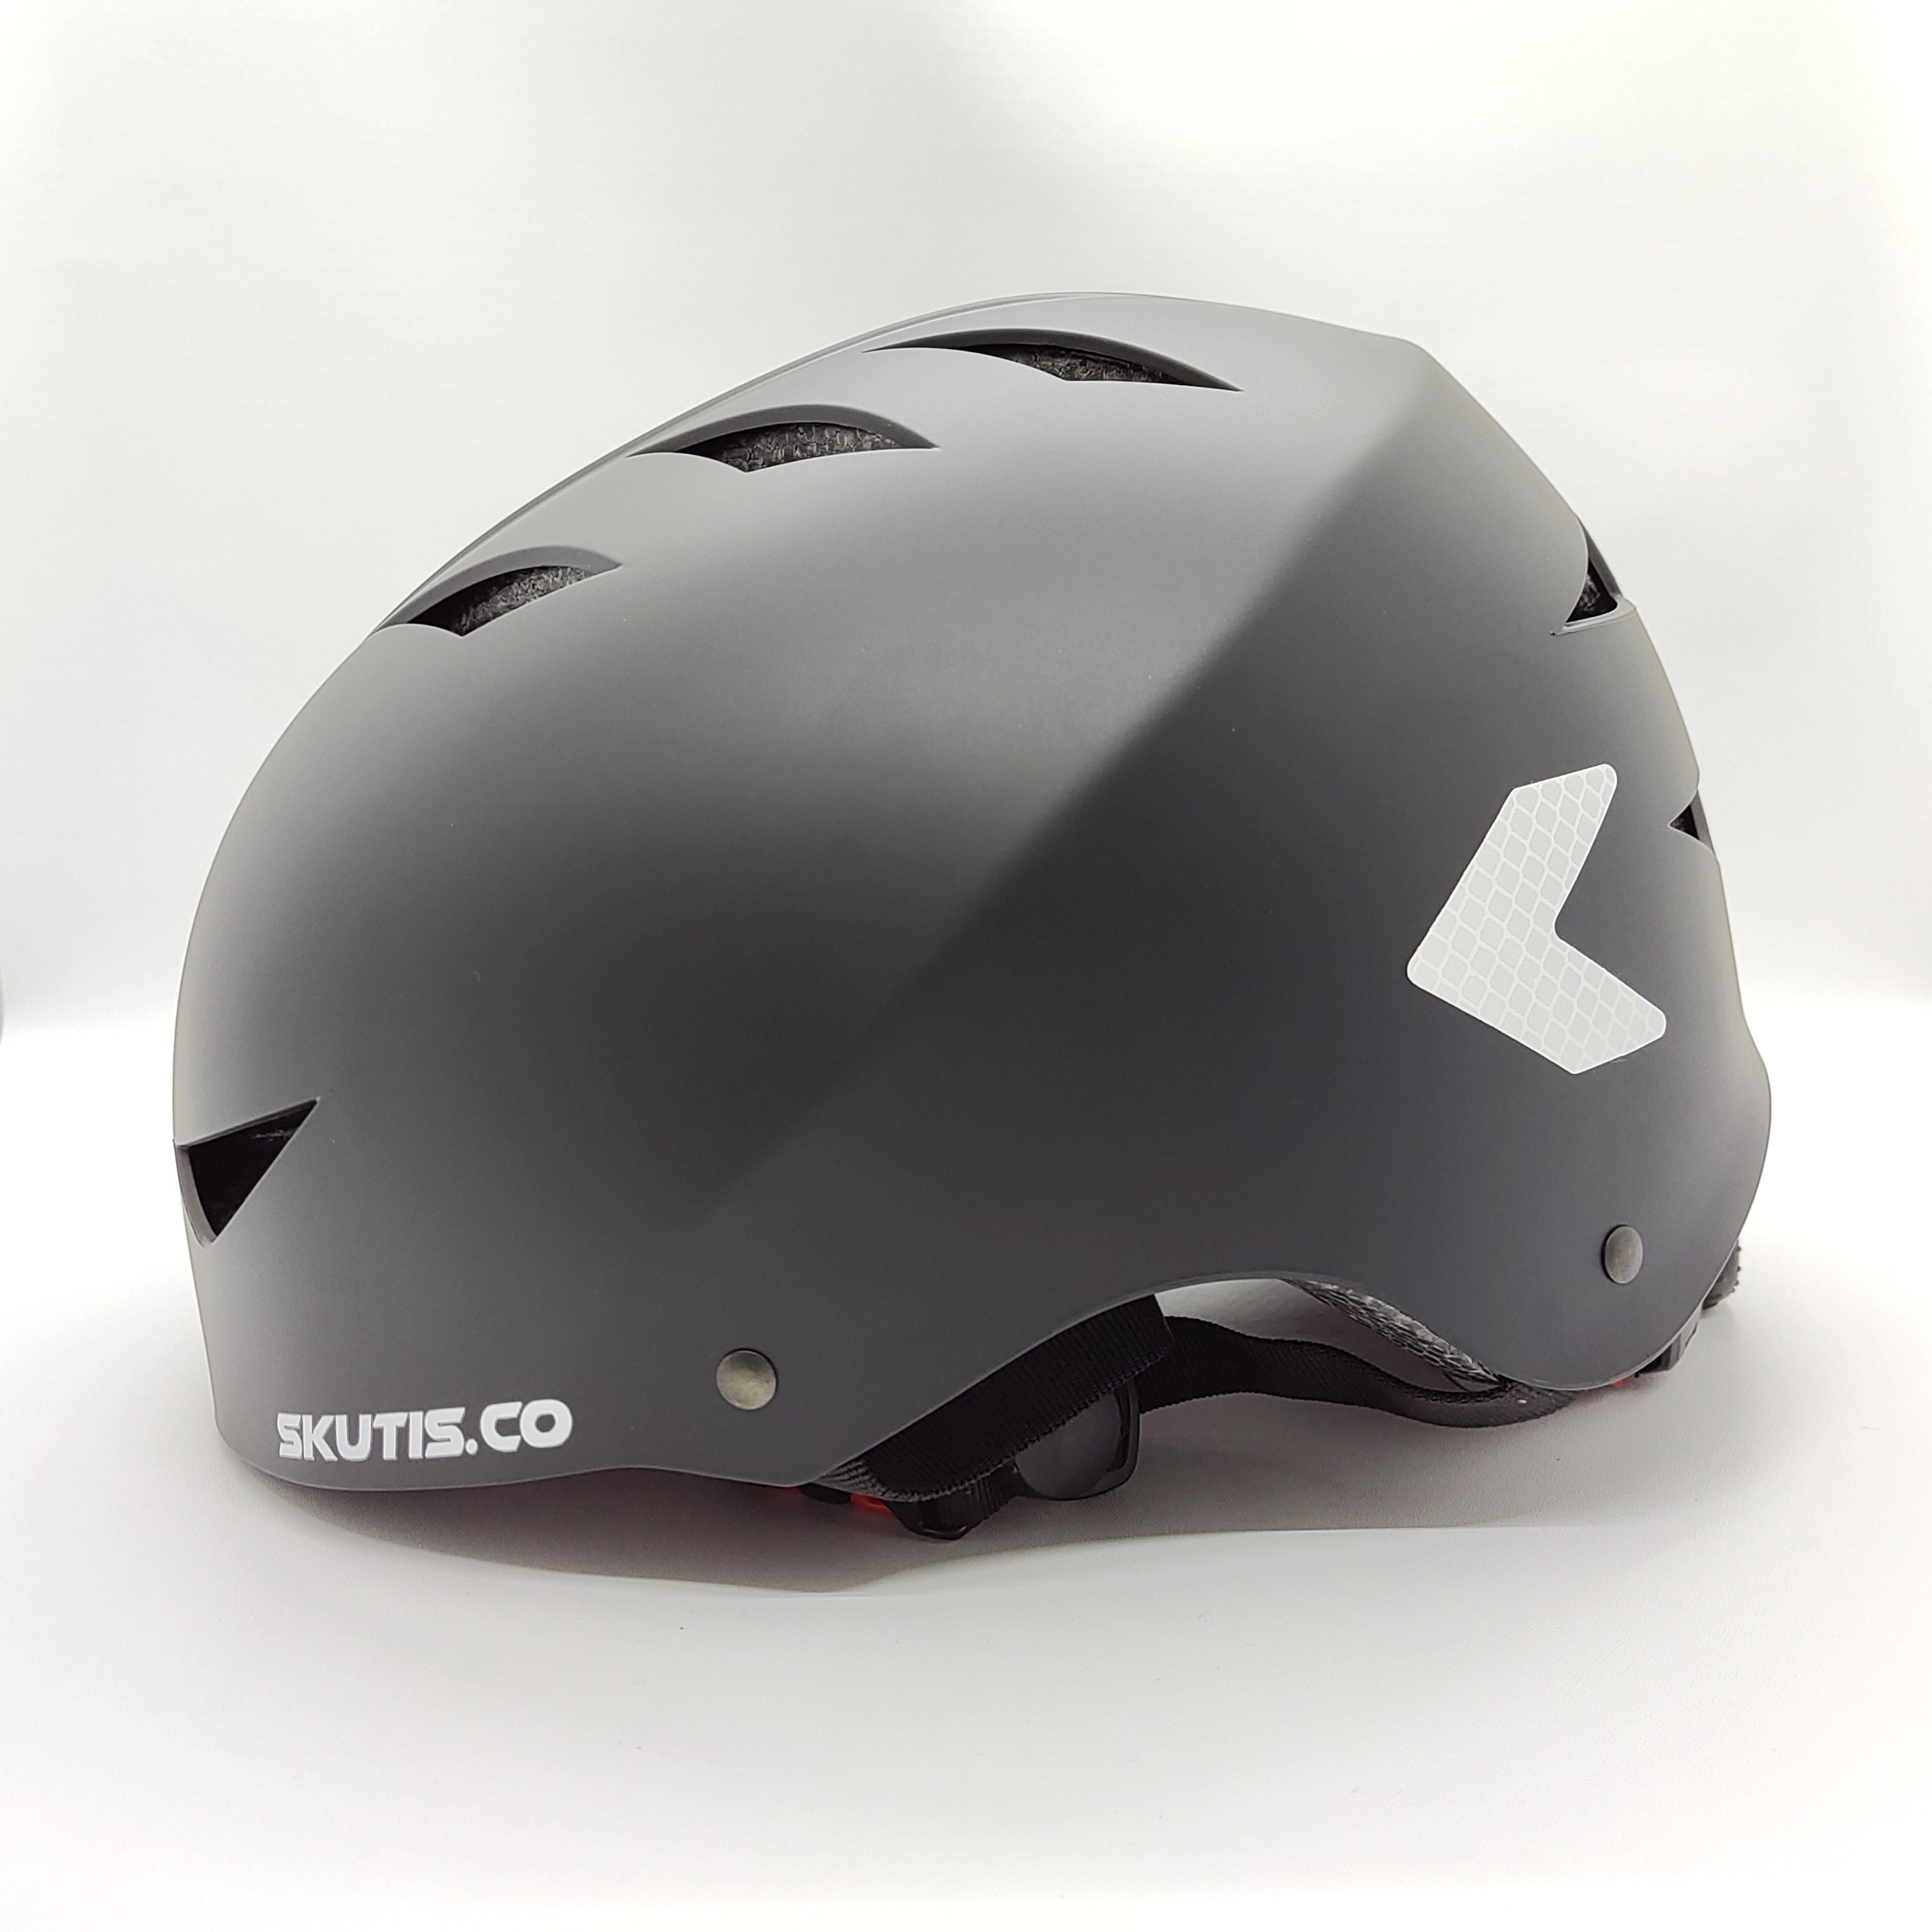 IMG 20200511 120028 - Skutis Gear Helmet